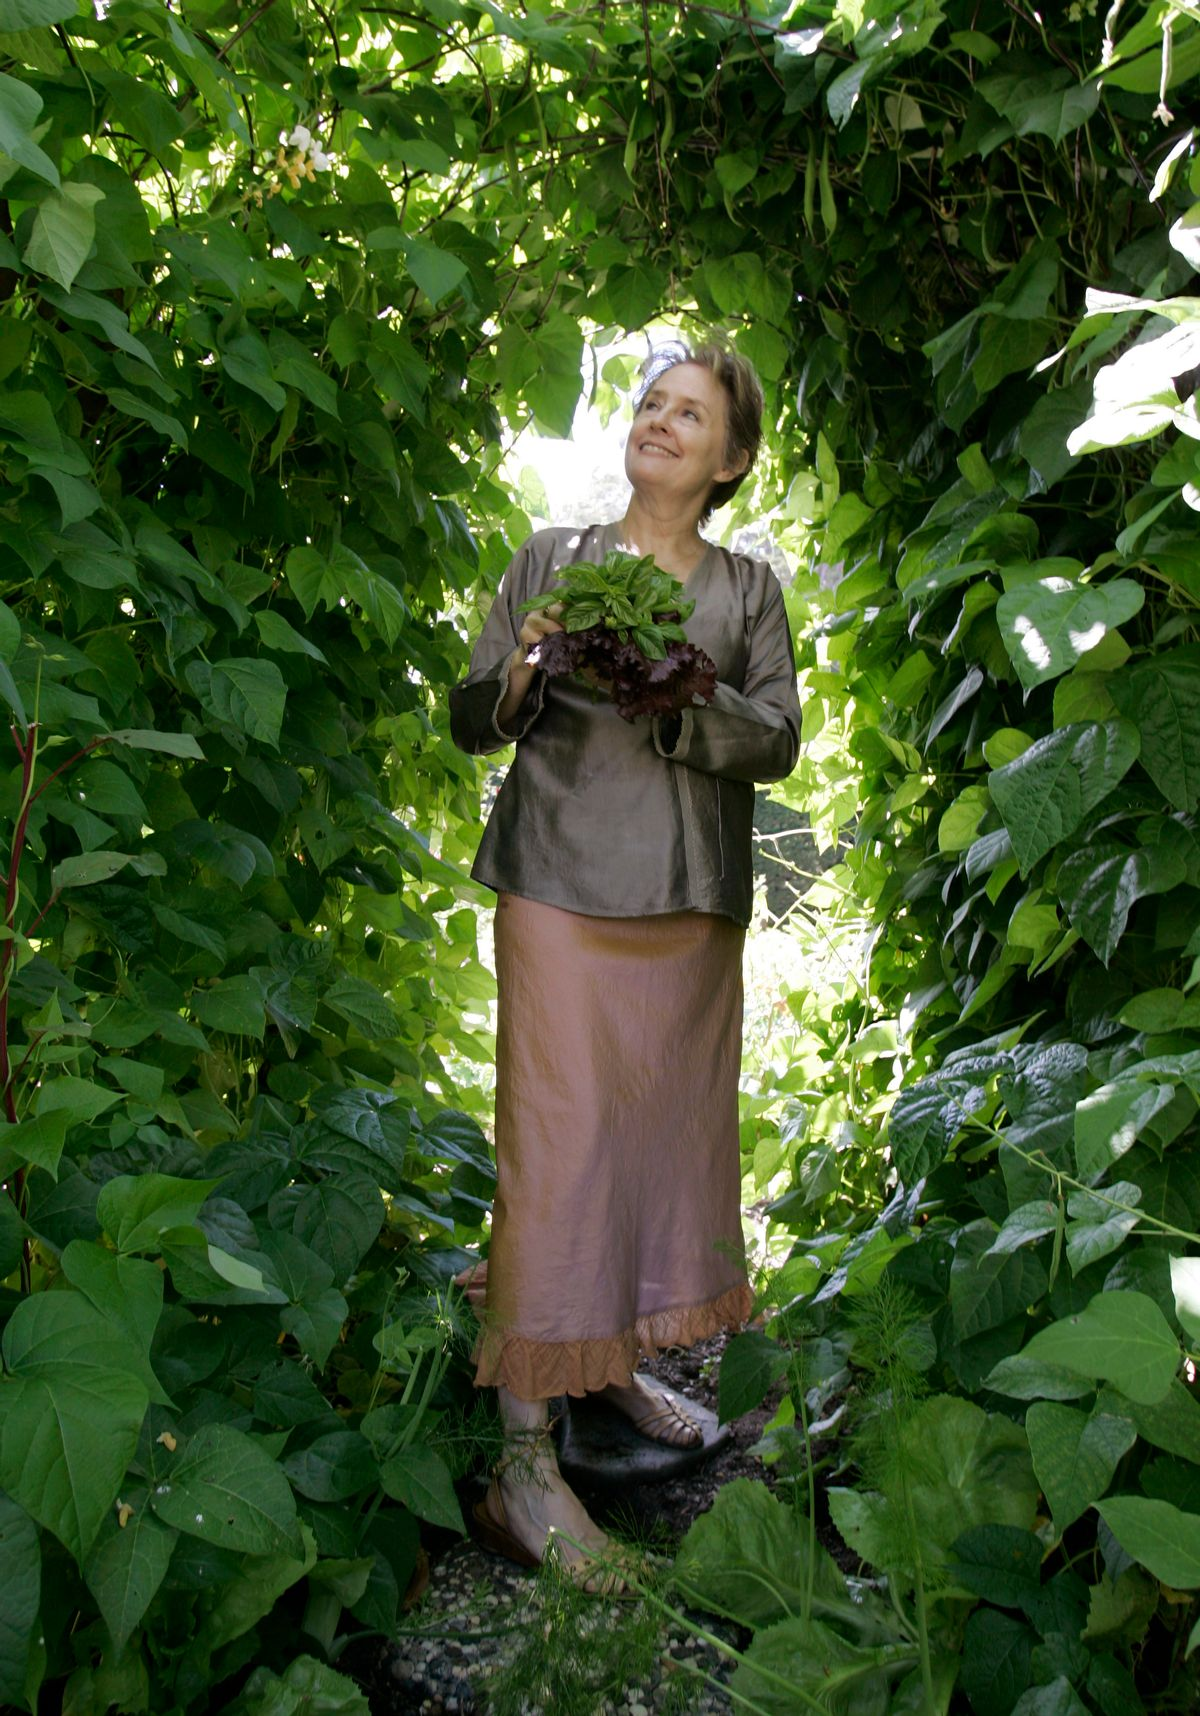 Alice Waters in her garden in Bolinas, Calif., Wednesday, Aug. 6, 2008. (AP Photo/Paul Sakuma) (Paul Sakuma)